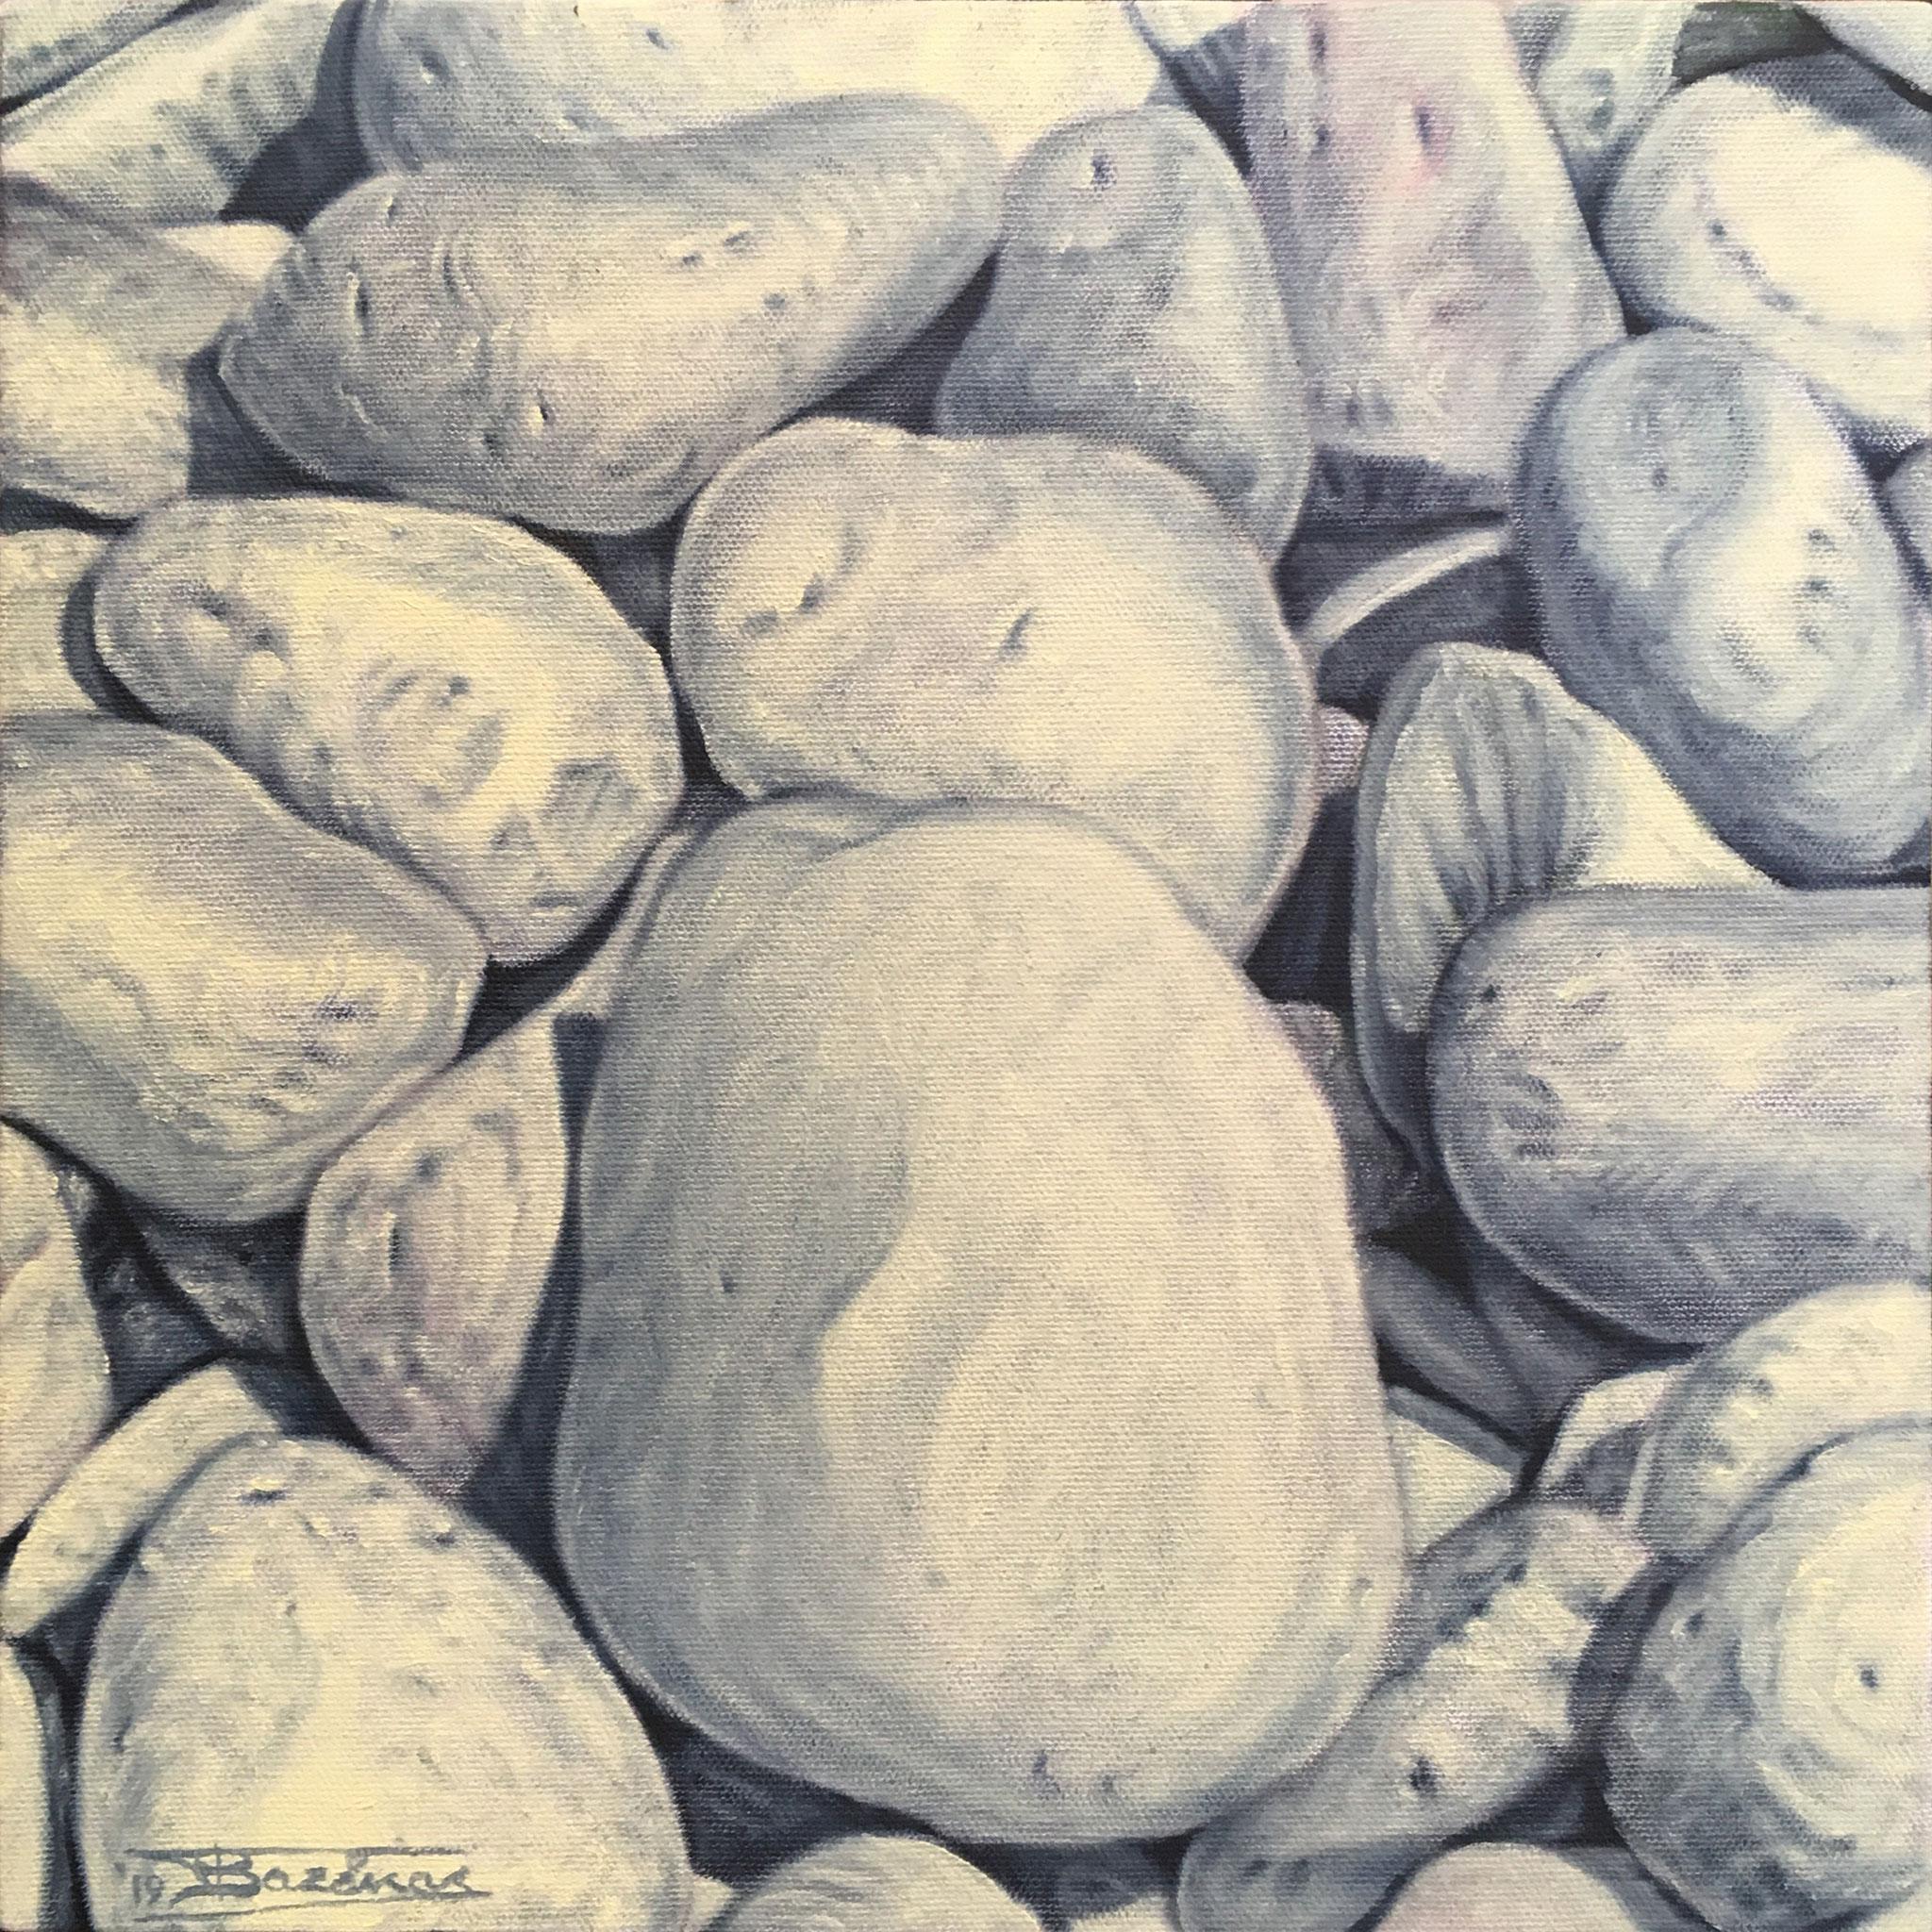 """Votsala#3""  (30x30)cm, Oil on linen canvas (2019) - Private collection"